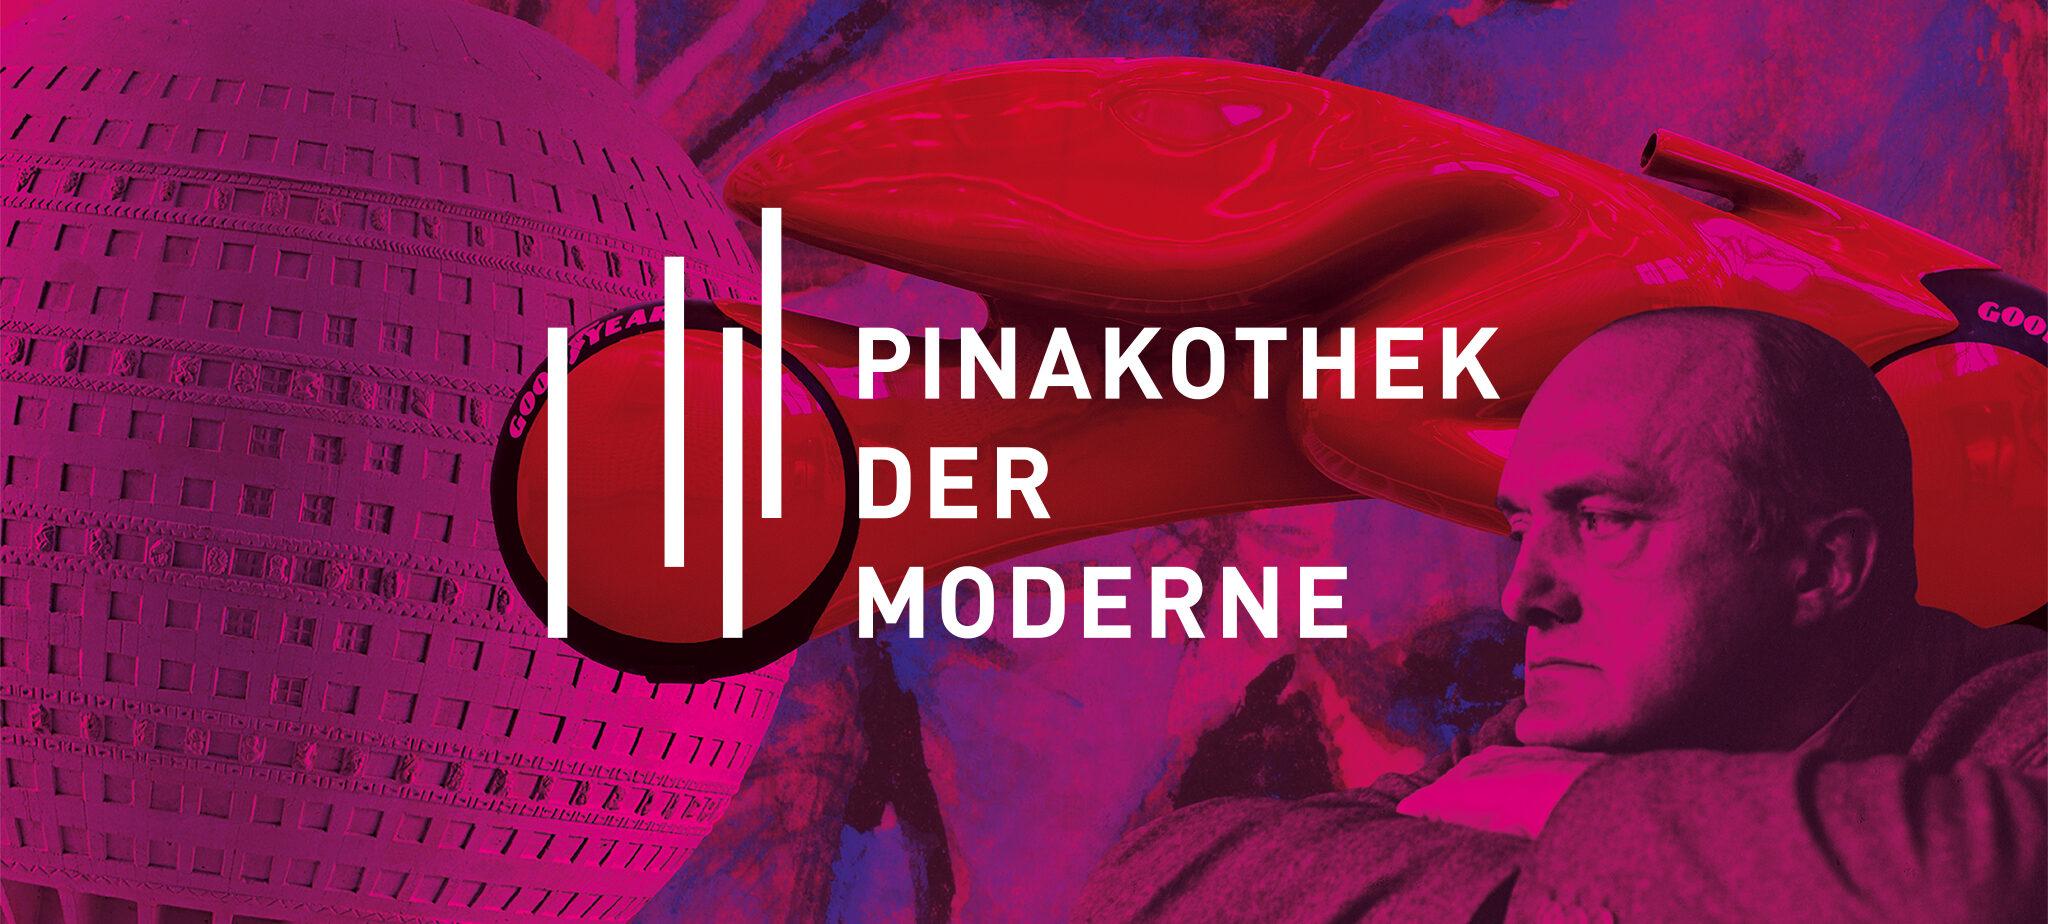 Pinakothek der Moderne Logo